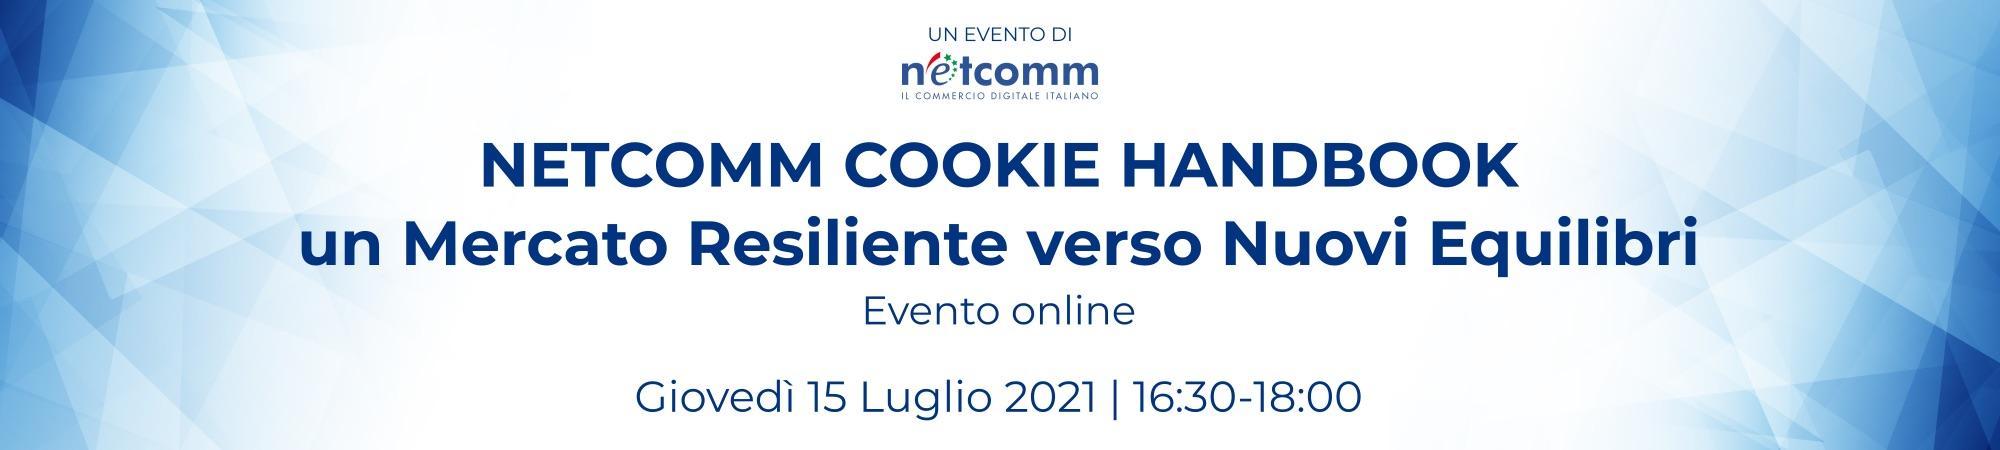 Netcomm Cookie Handbook: un Mercato Resiliente verso Nuovi Equilibri